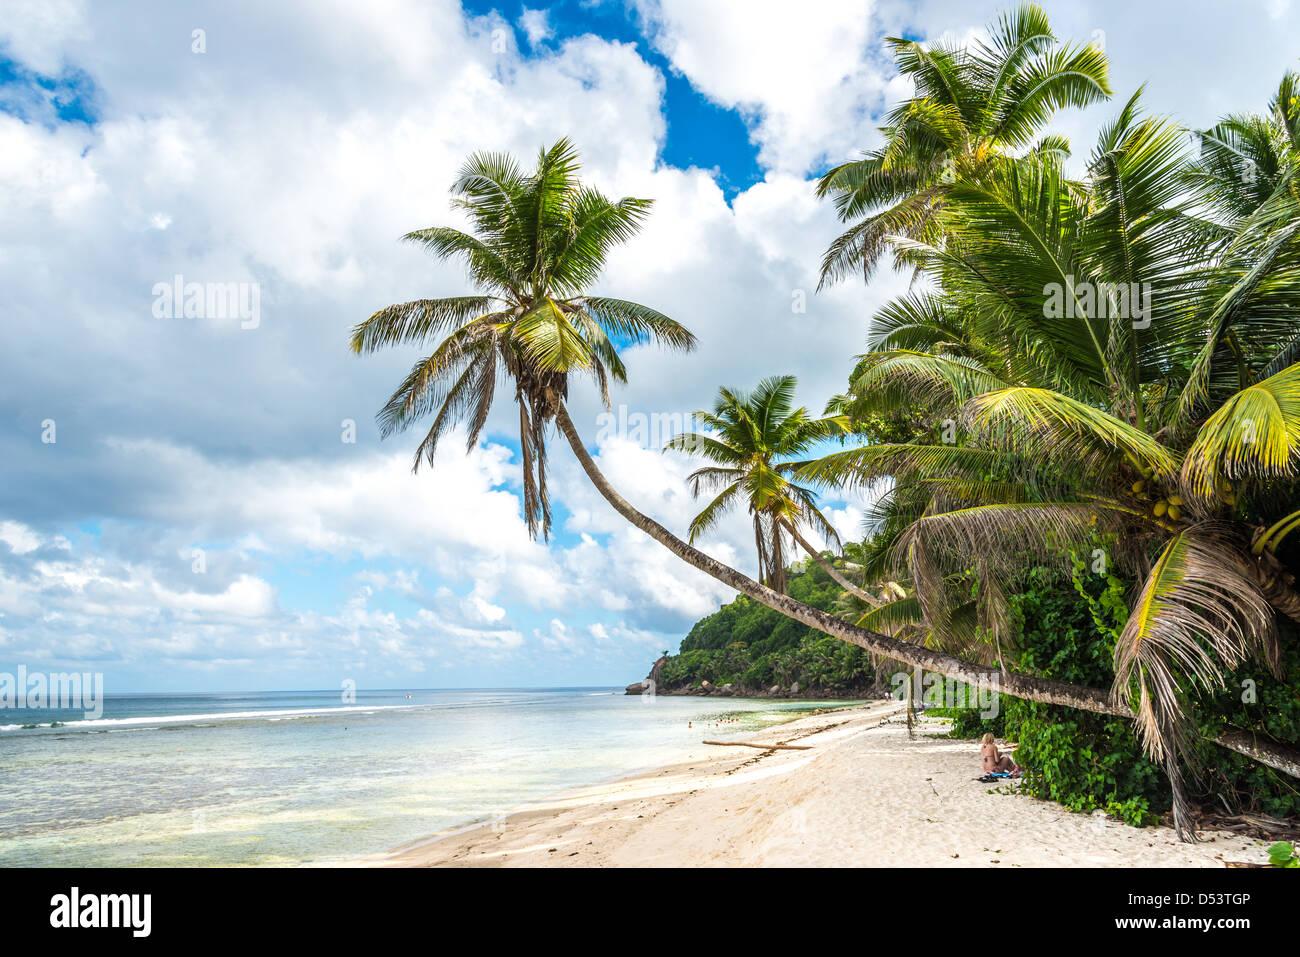 beach on Mahe island, Seychelles - Stock Image